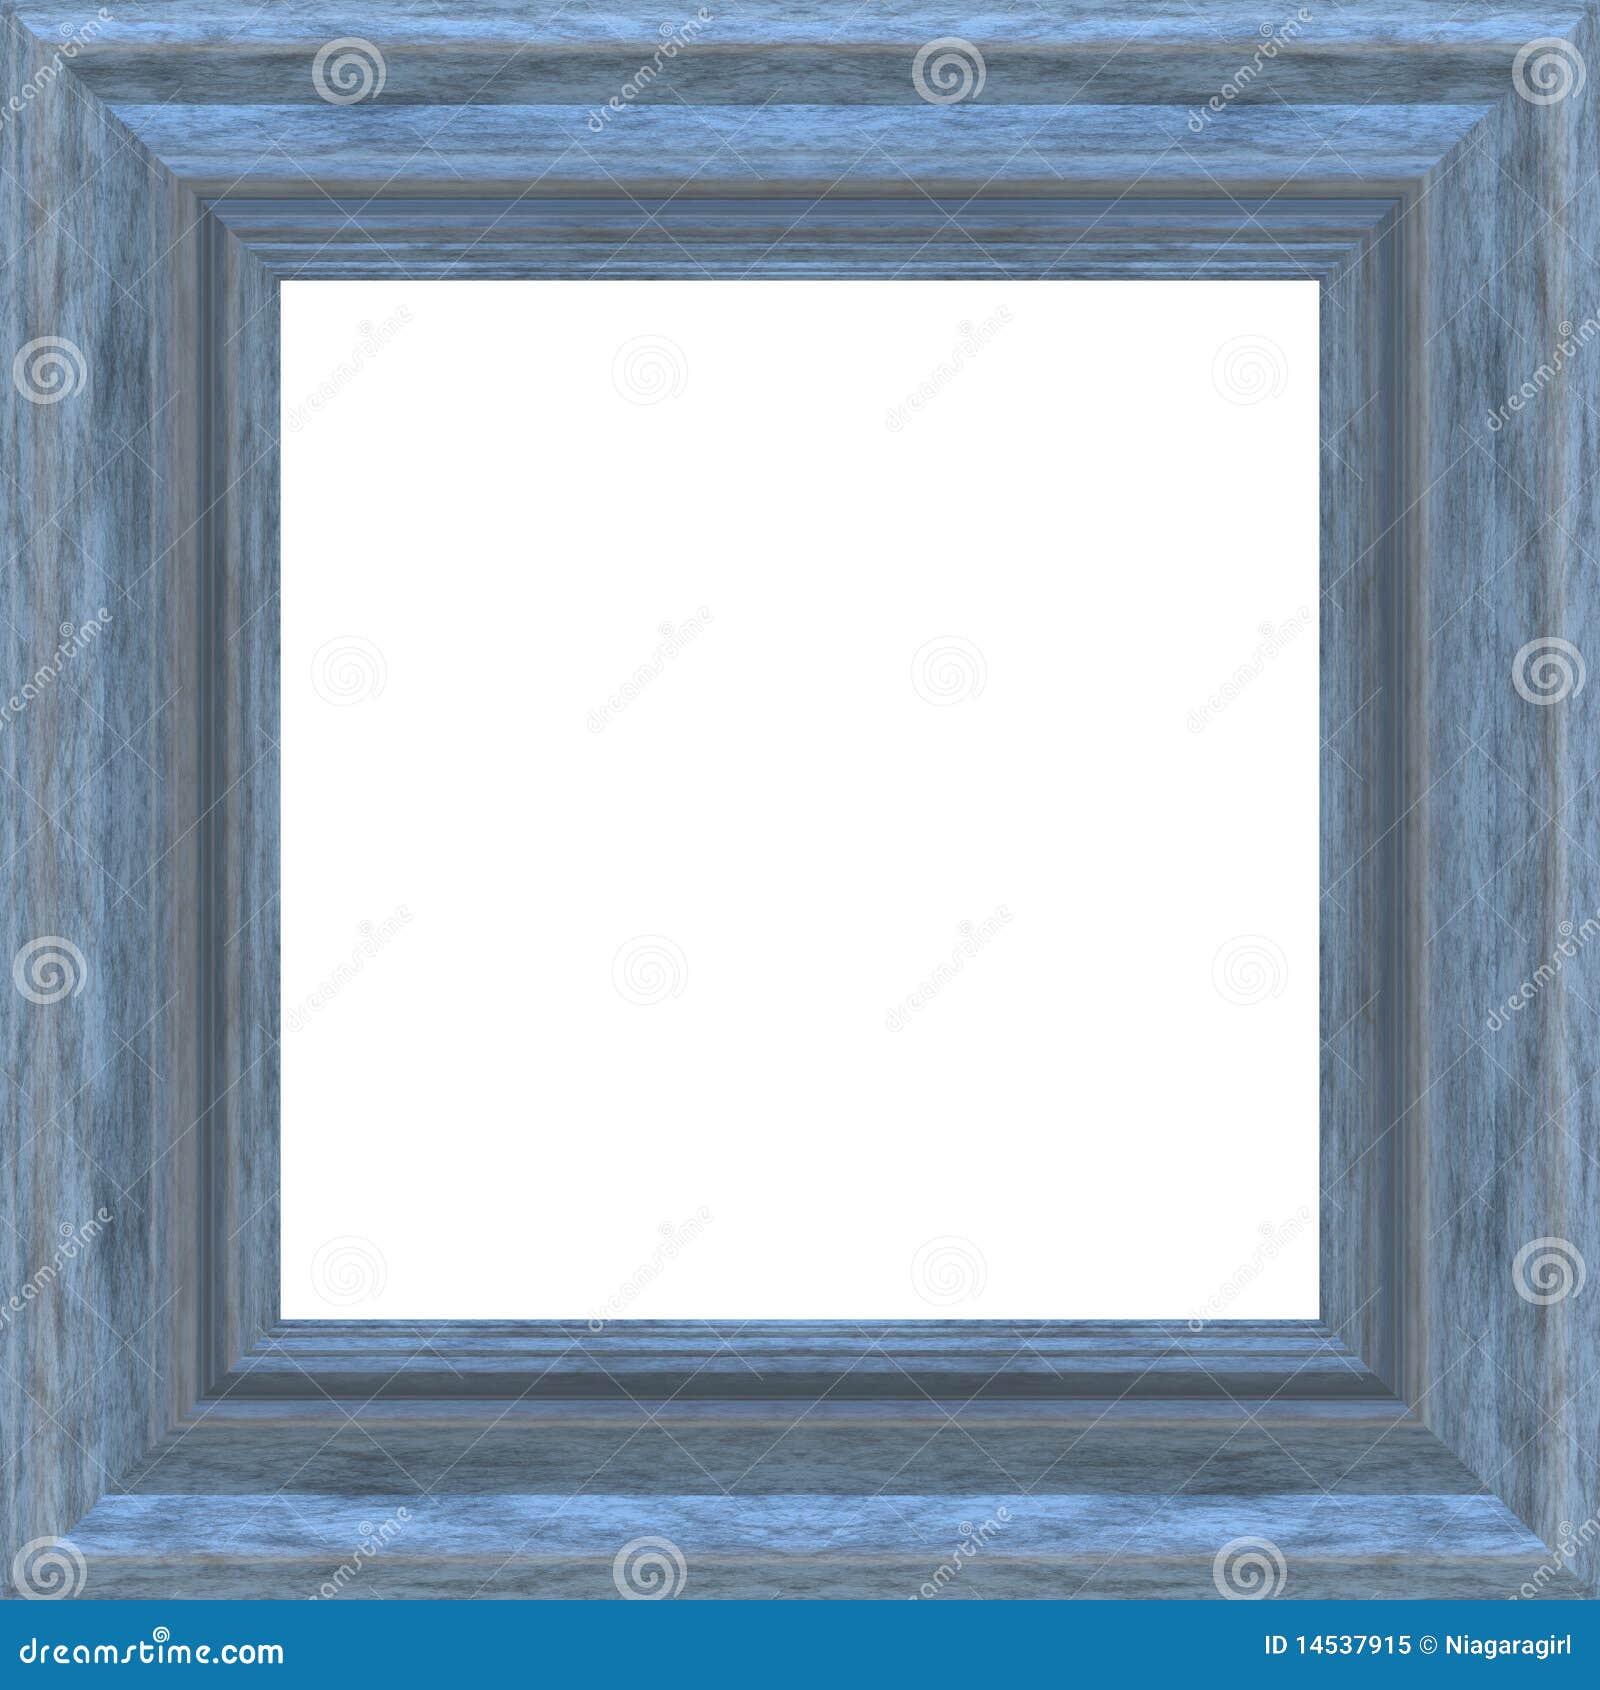 Square Blue Wood Frame Stock Illustration Illustration Of